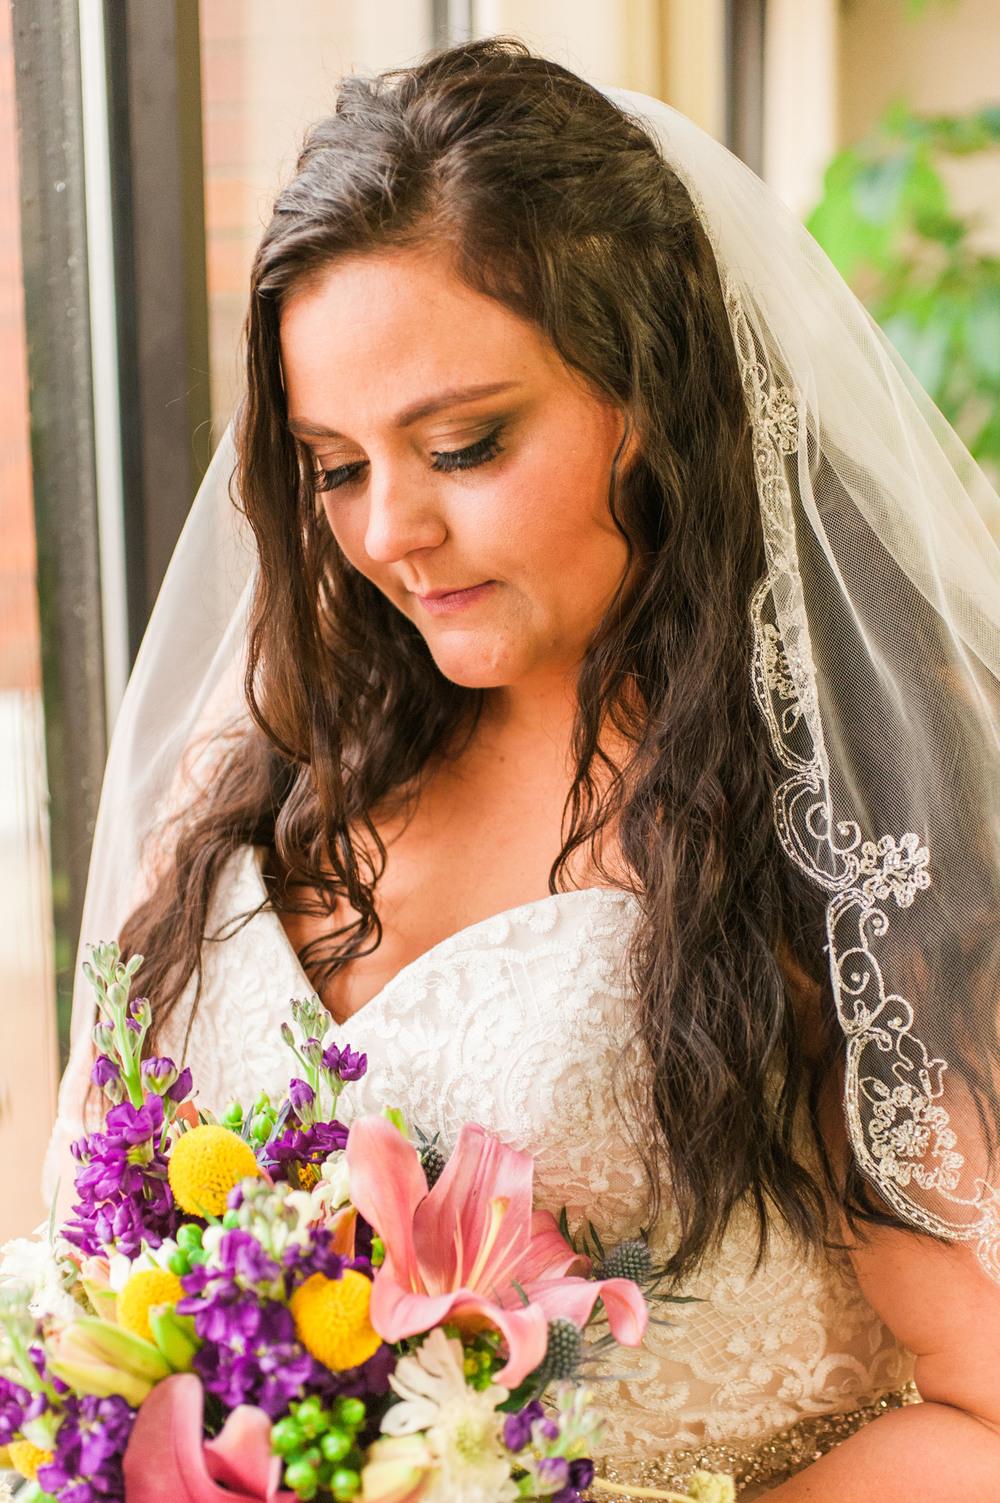 omaha-wedding-vendor-samantha-weddings--7.jpg